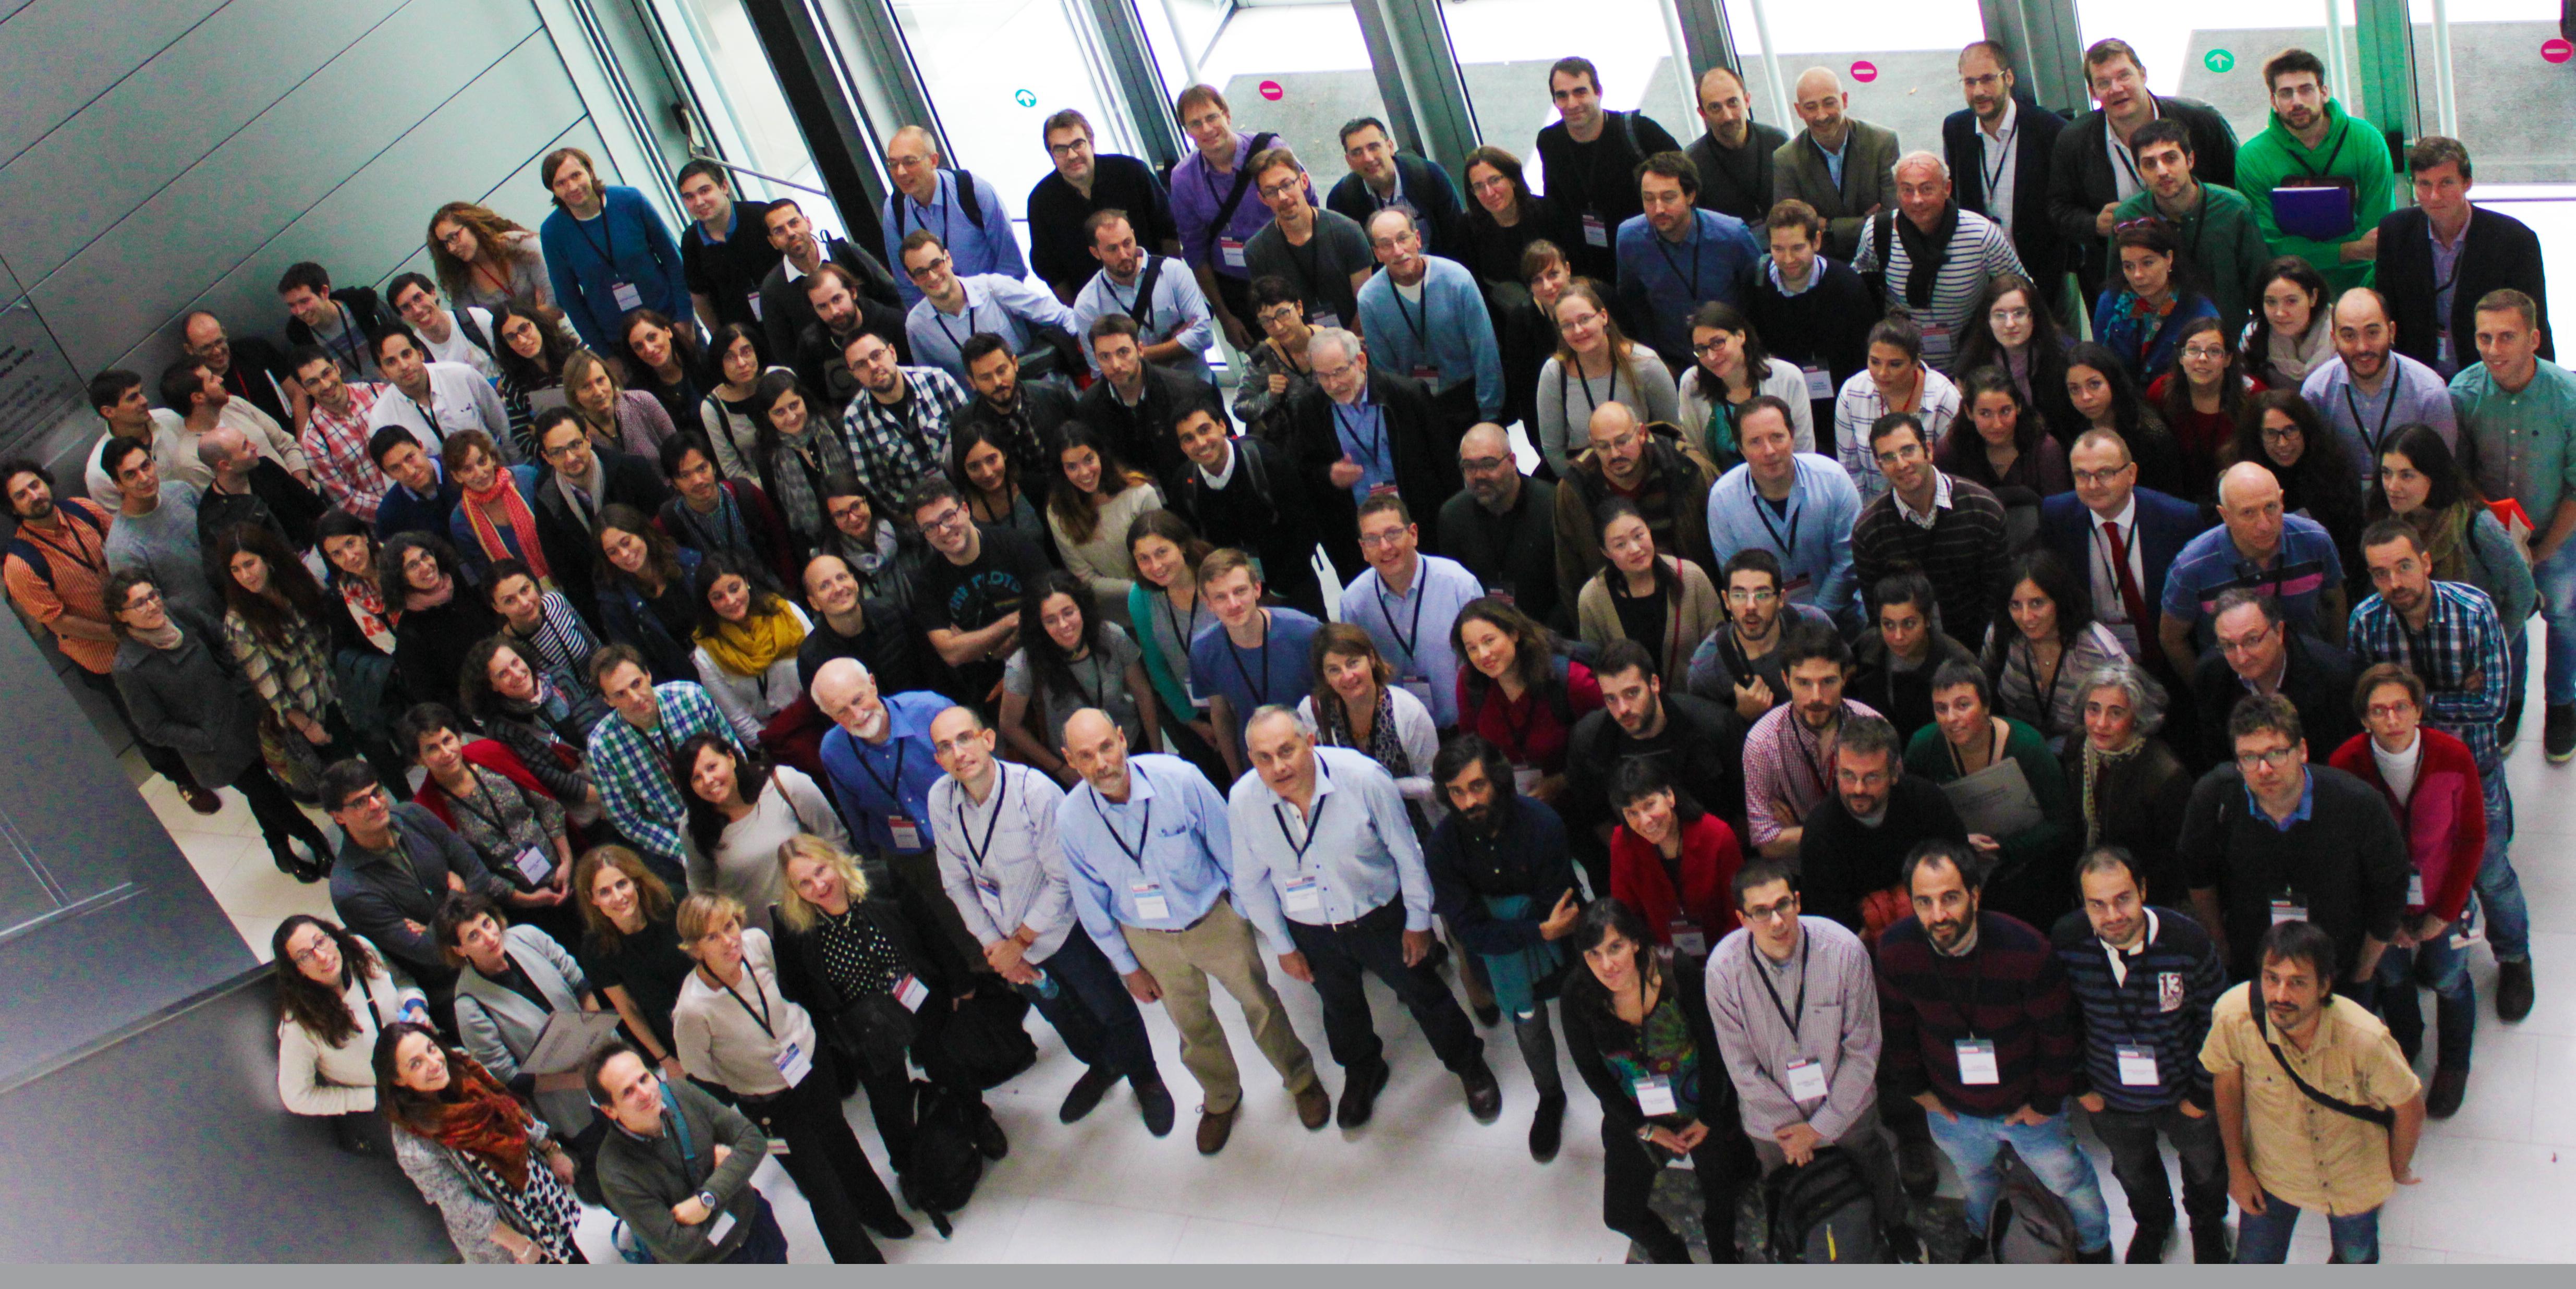 Los participantes de la CNIC Conferenc